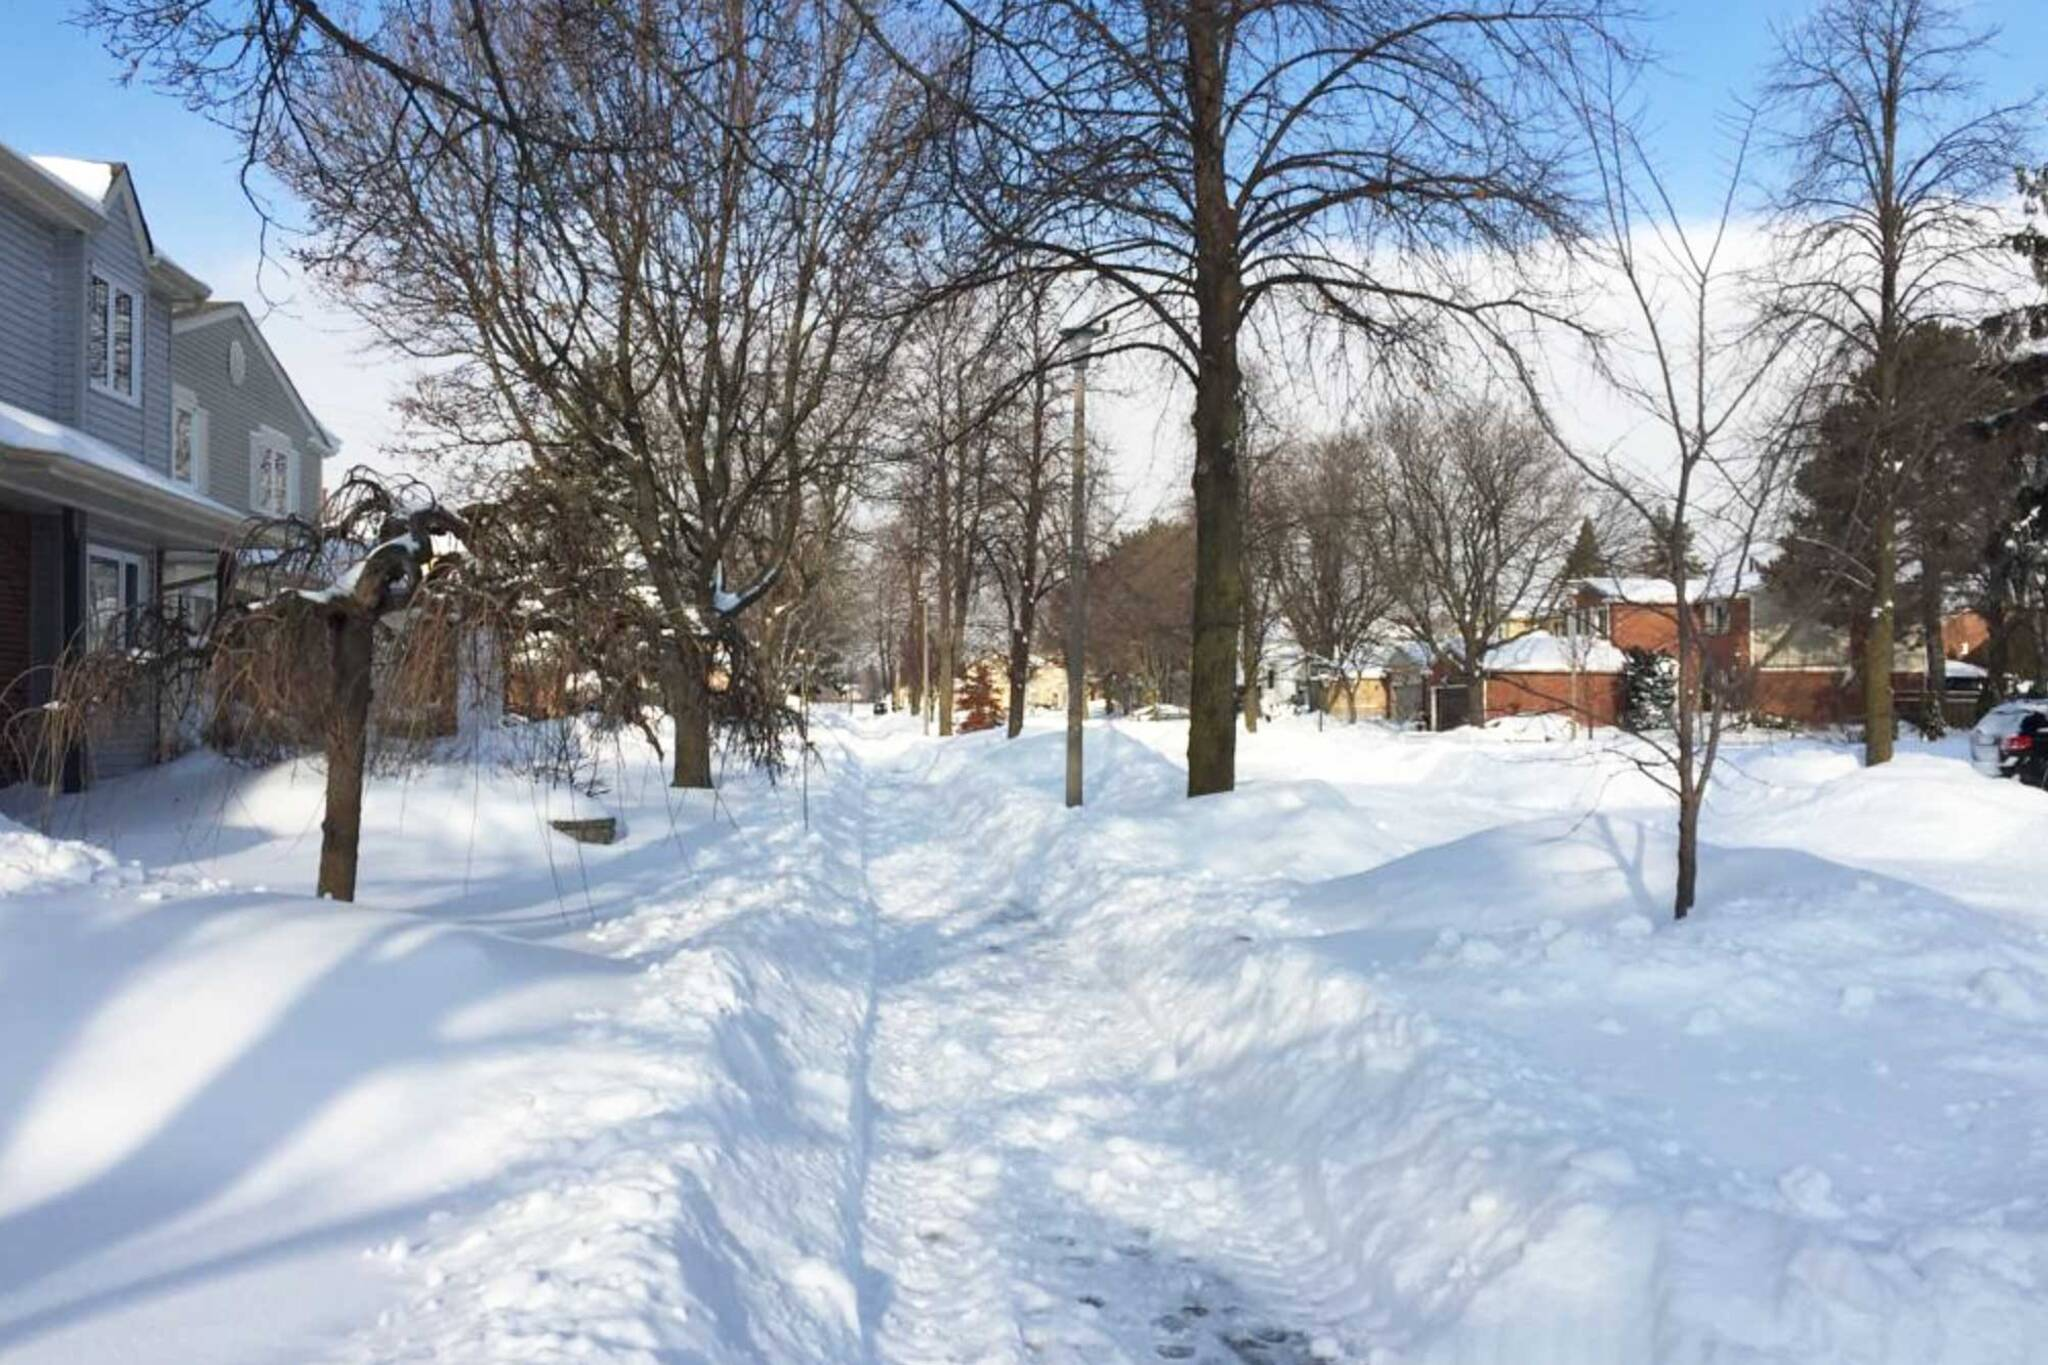 city of toronto snow removal complaints